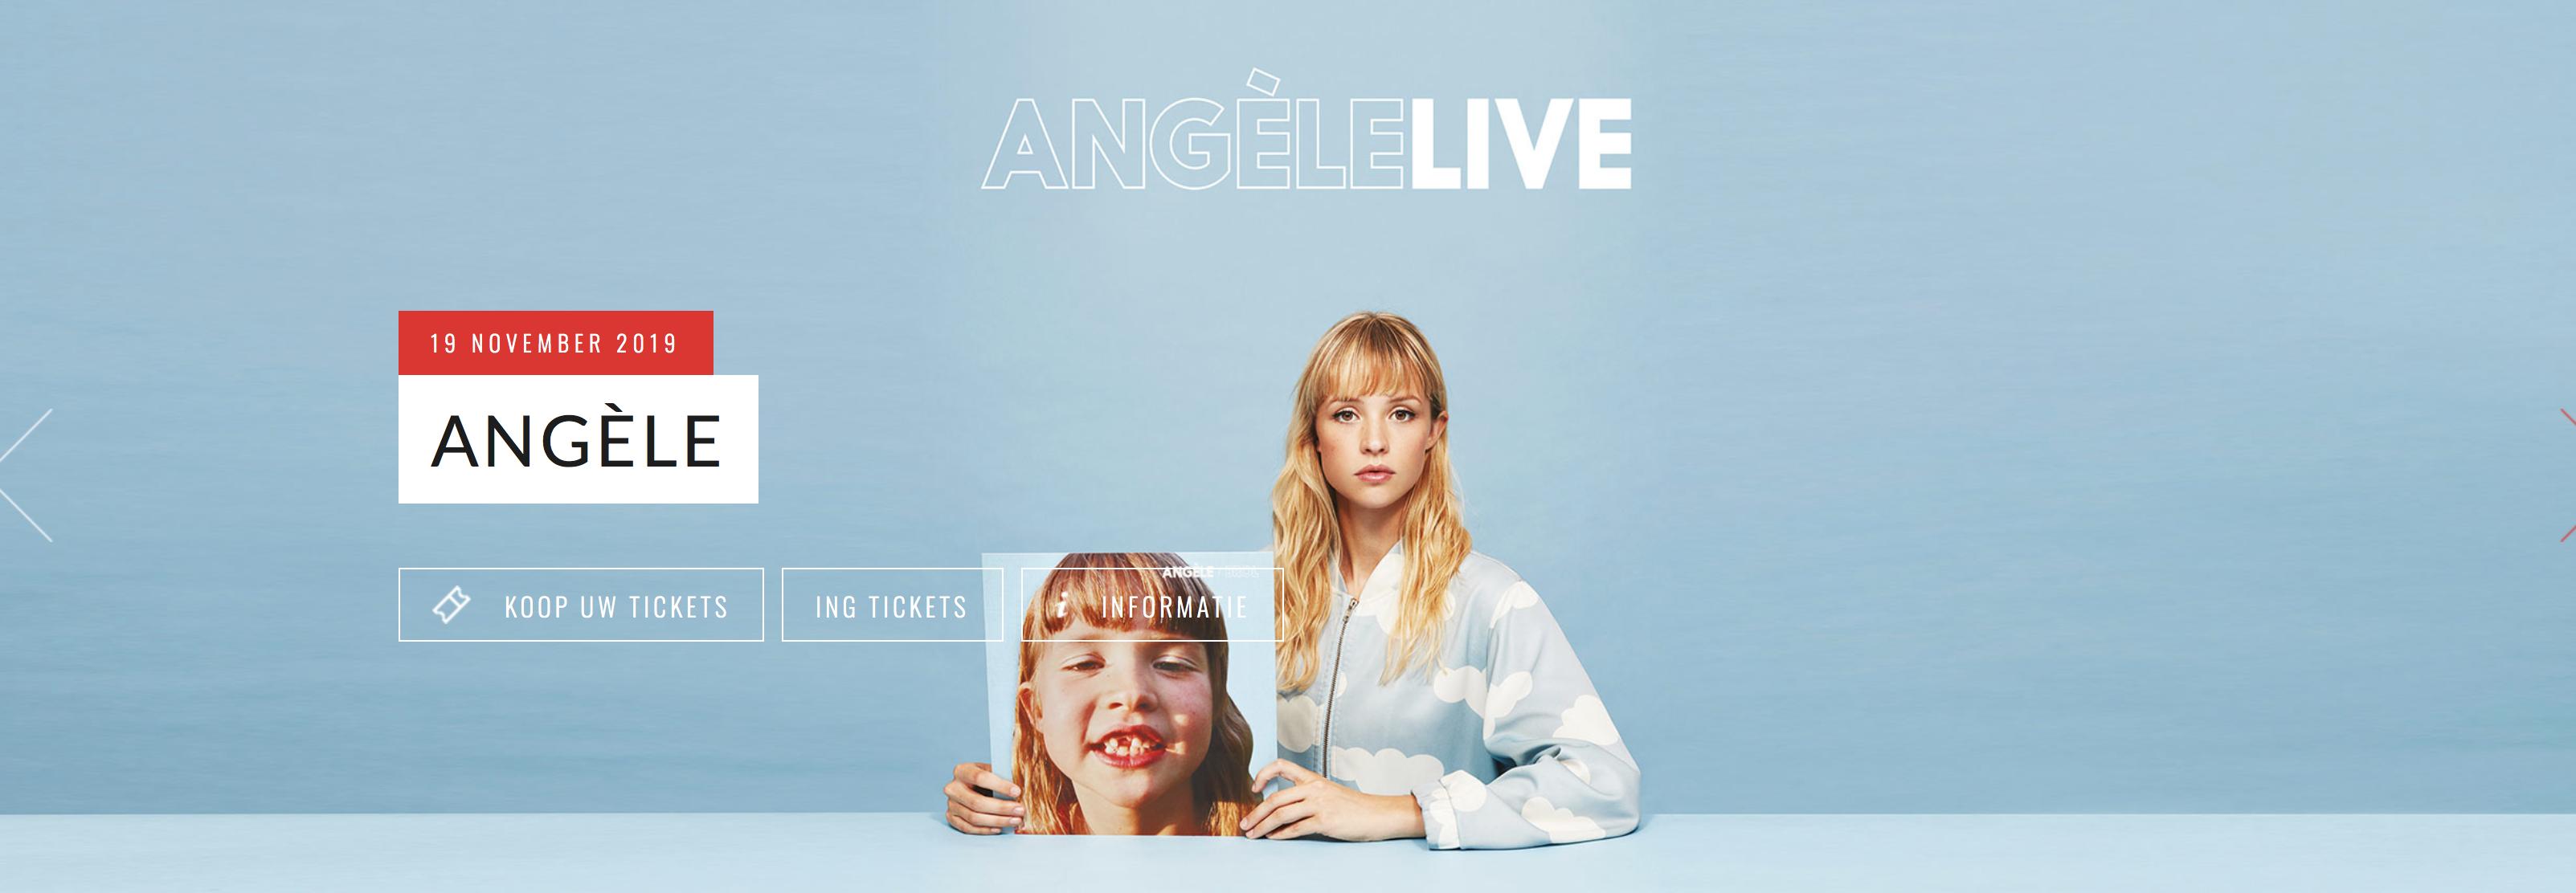 ANGÈlE - LIVE 19 NOVEMBER 2019